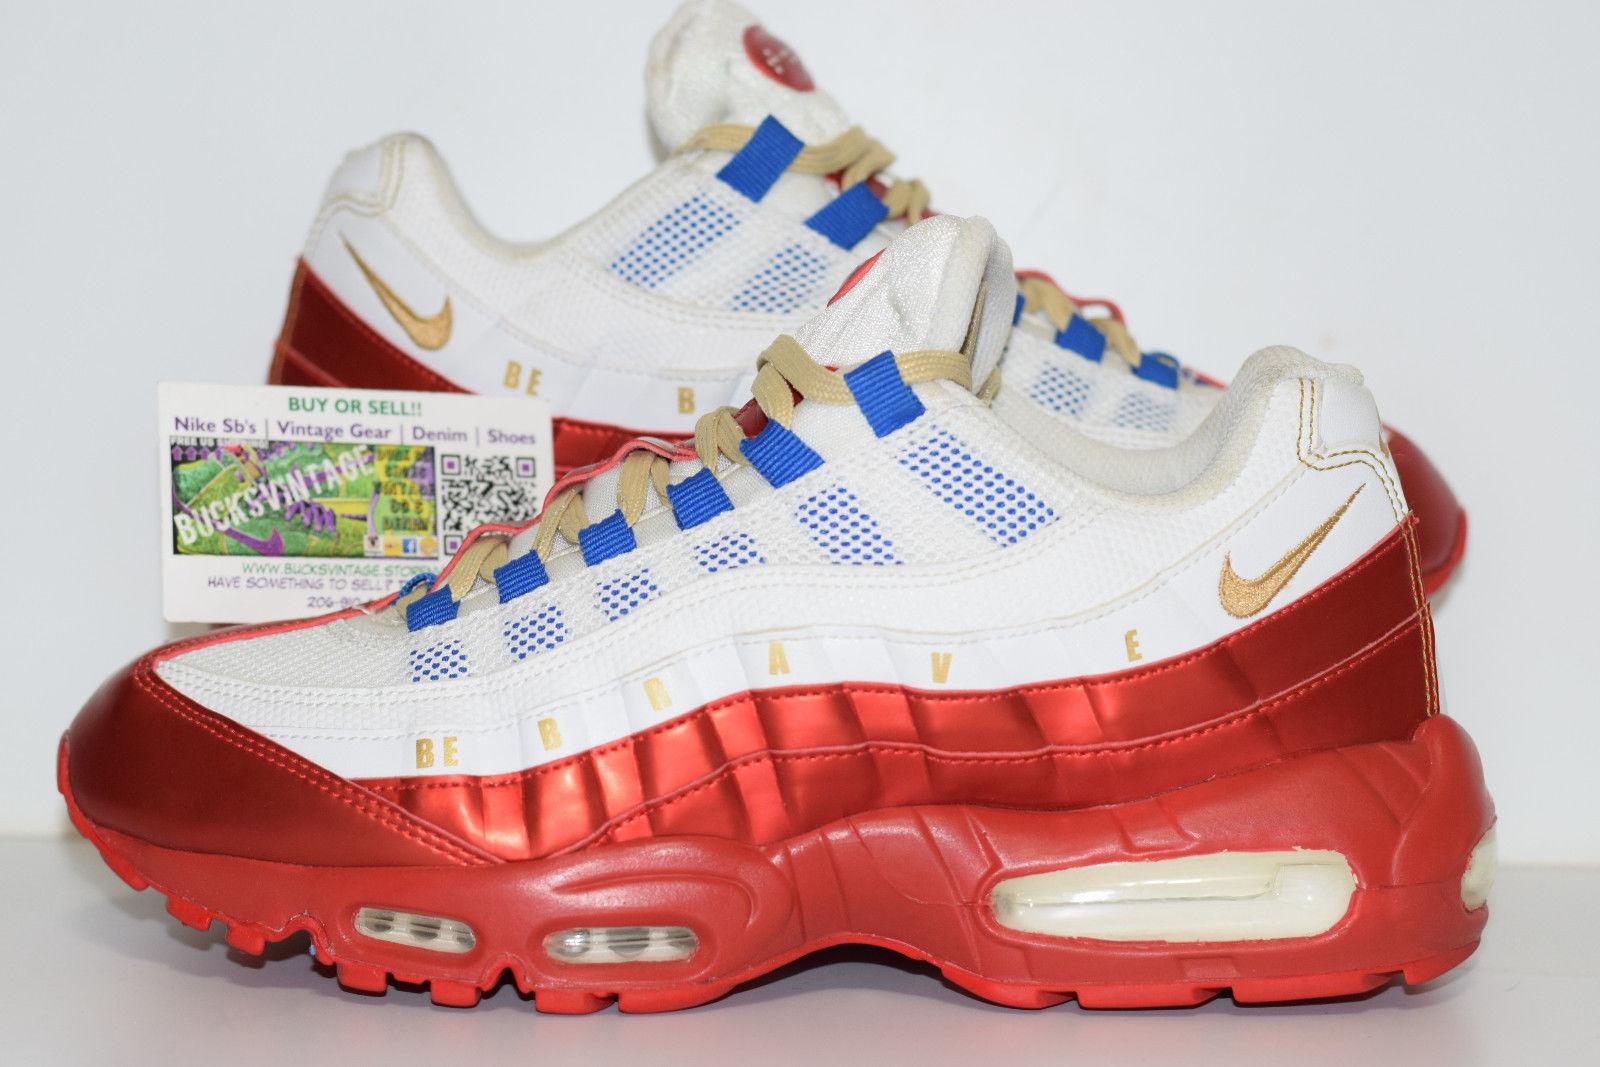 newest 41334 12082 Size 8 | 2011 Nike Air Max 95 Doernbecher Daniel Blair 507450-180 ...